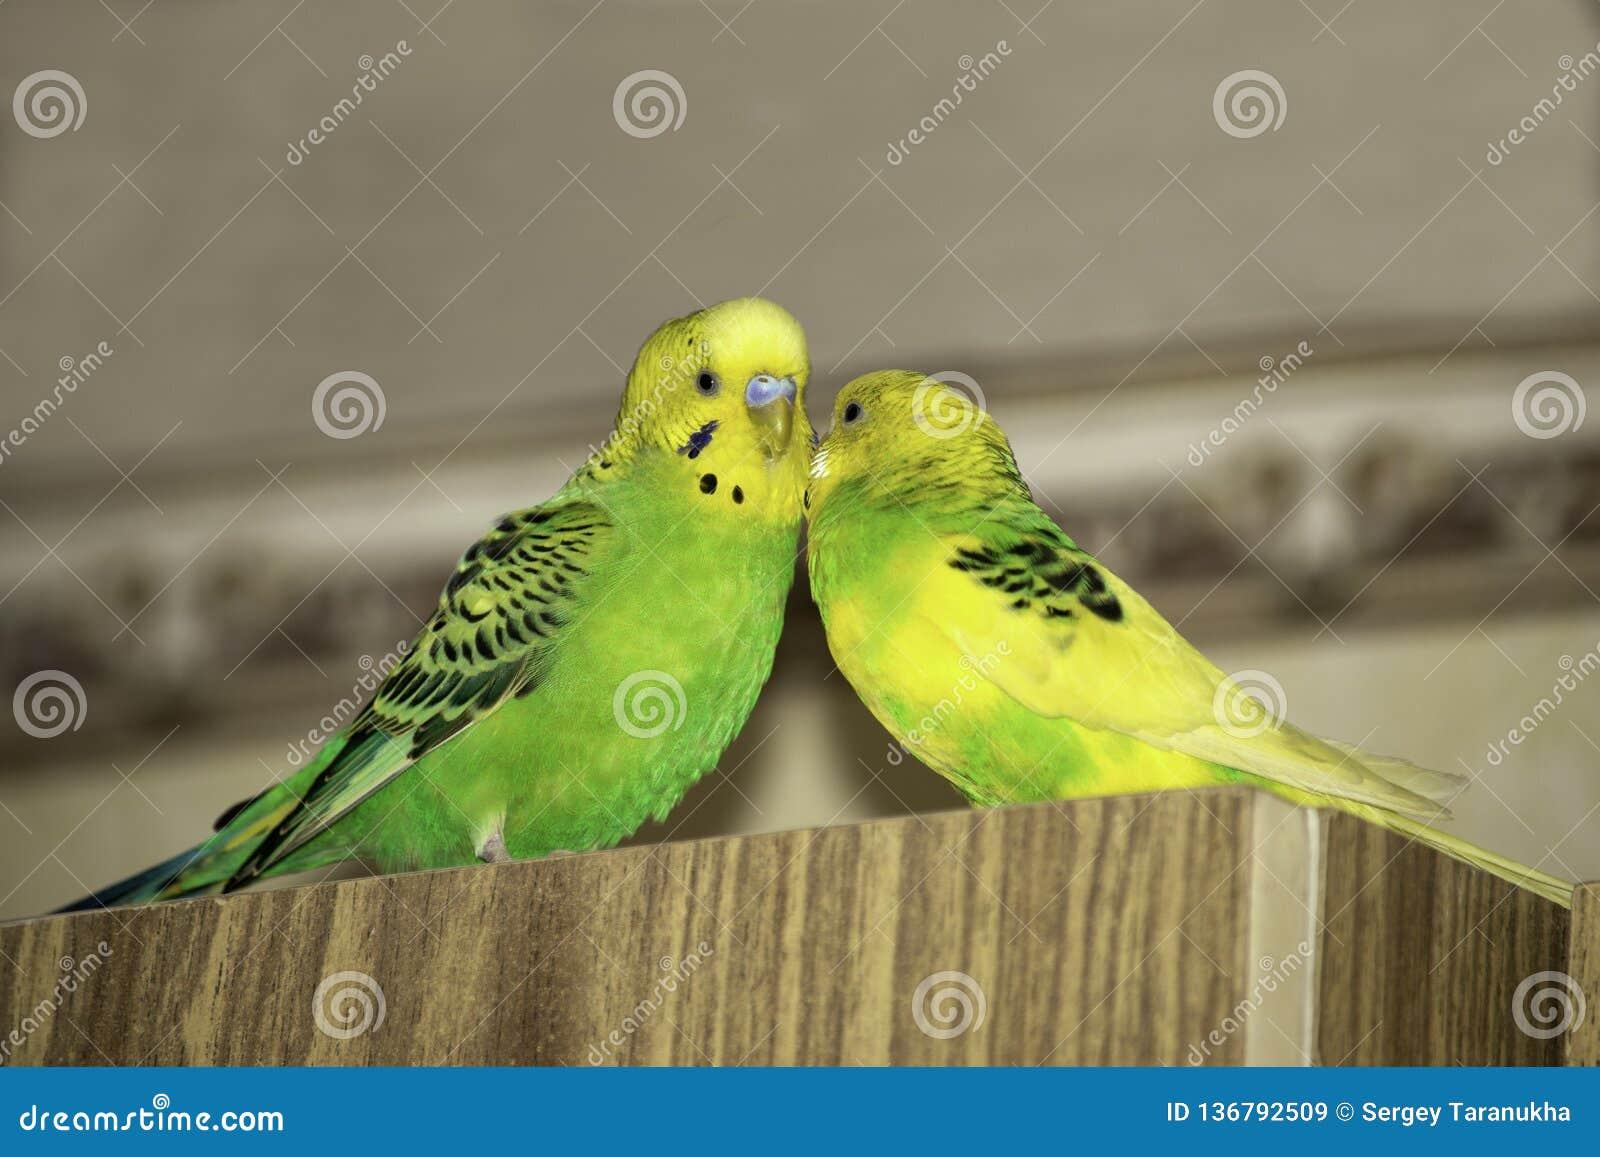 Två krabba papegojor sitter på garderoben